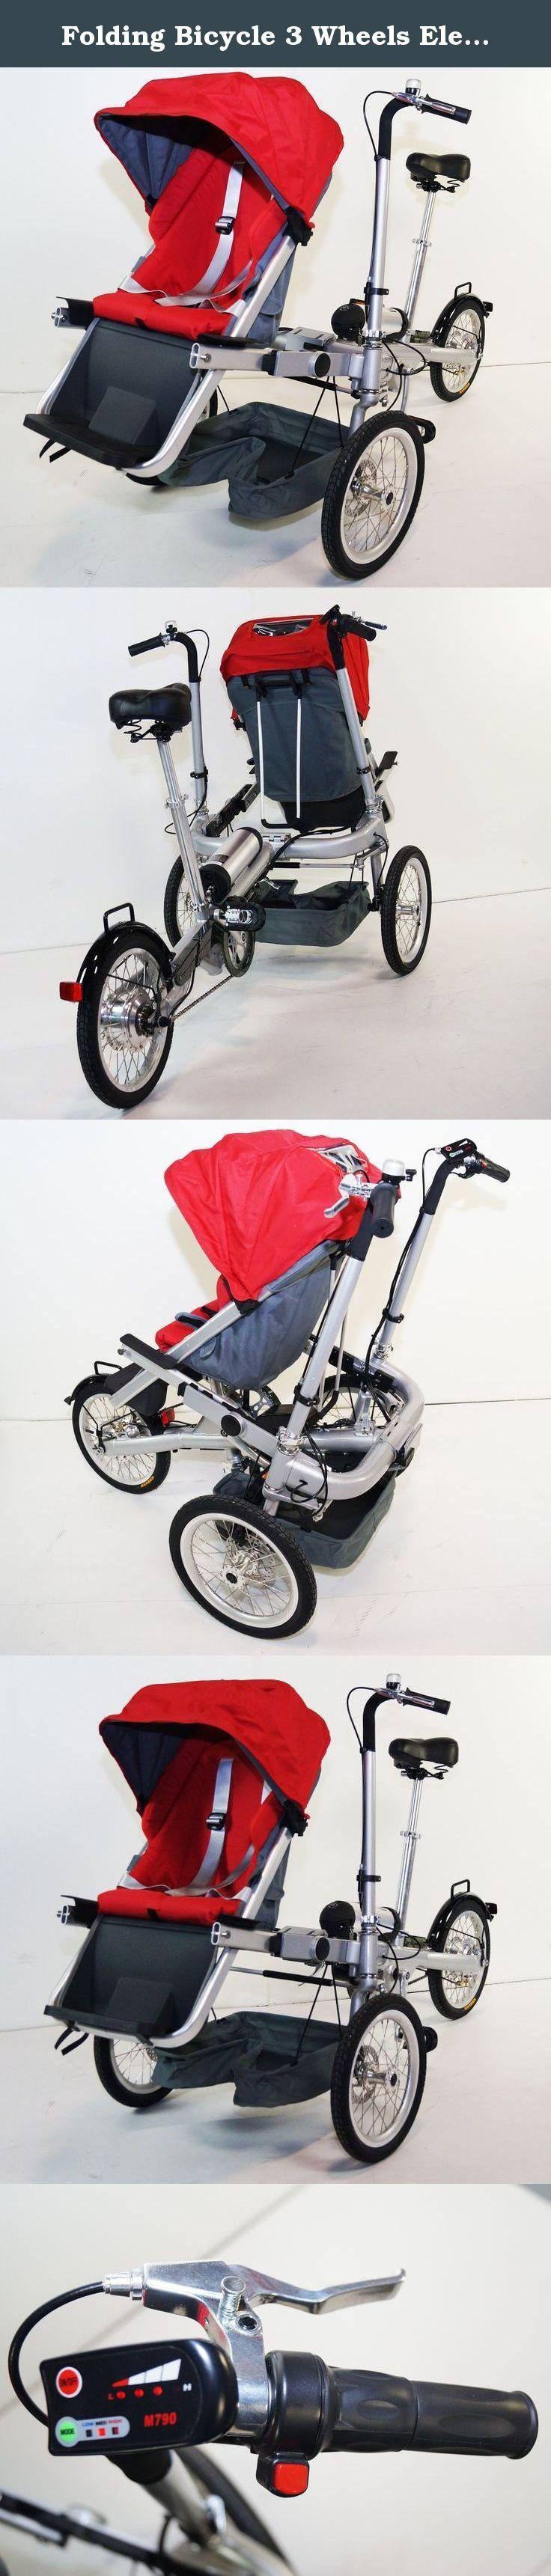 Folding Bicycle 3 Wheels Electric Stroller Bike Jogging